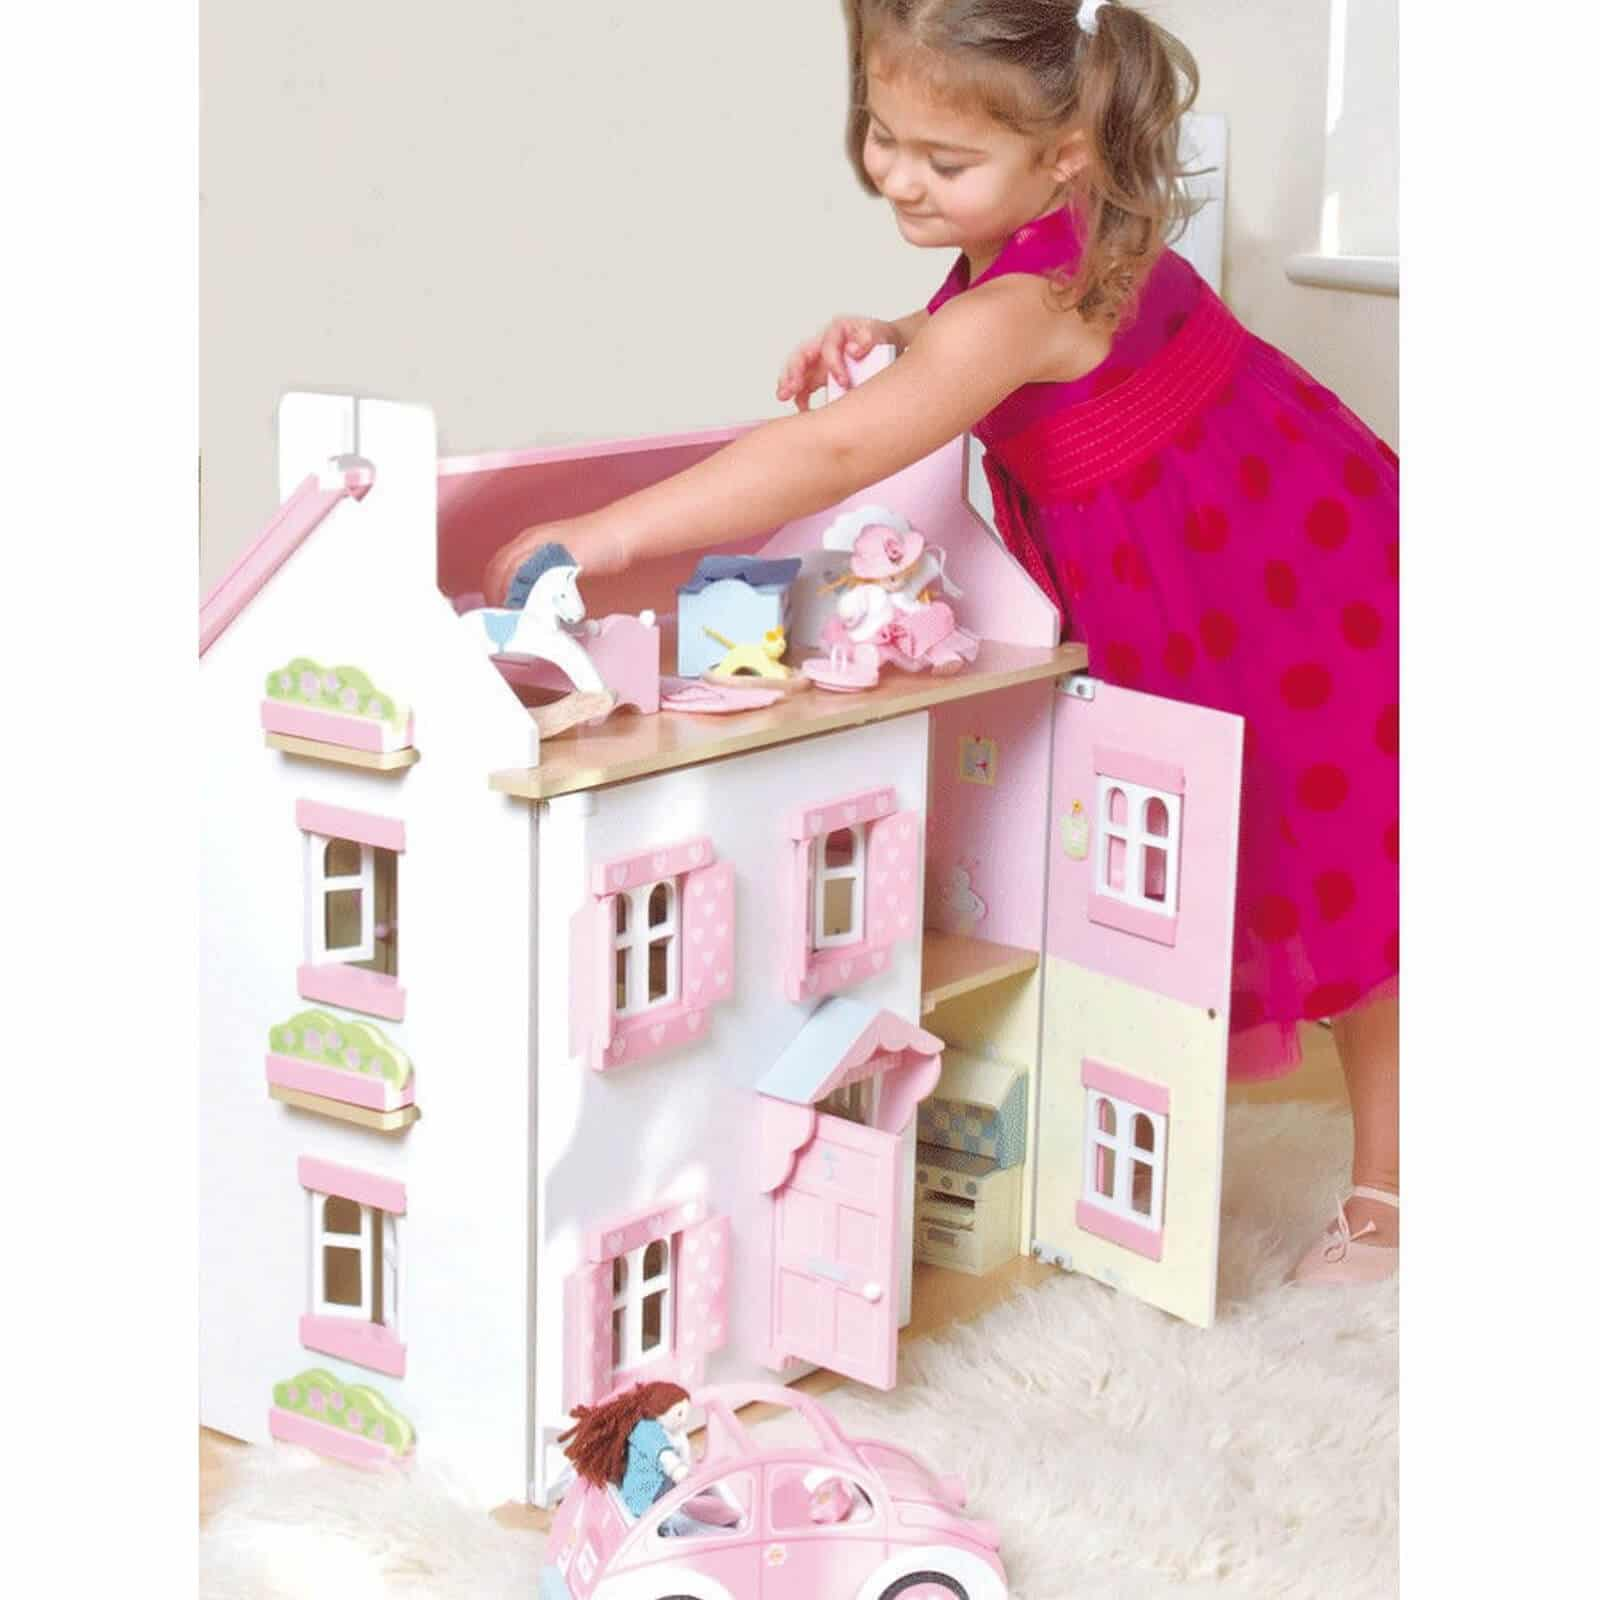 Le Toy Van Sophie 39 S House And Furniture Pack Bundle Jadrem Toys